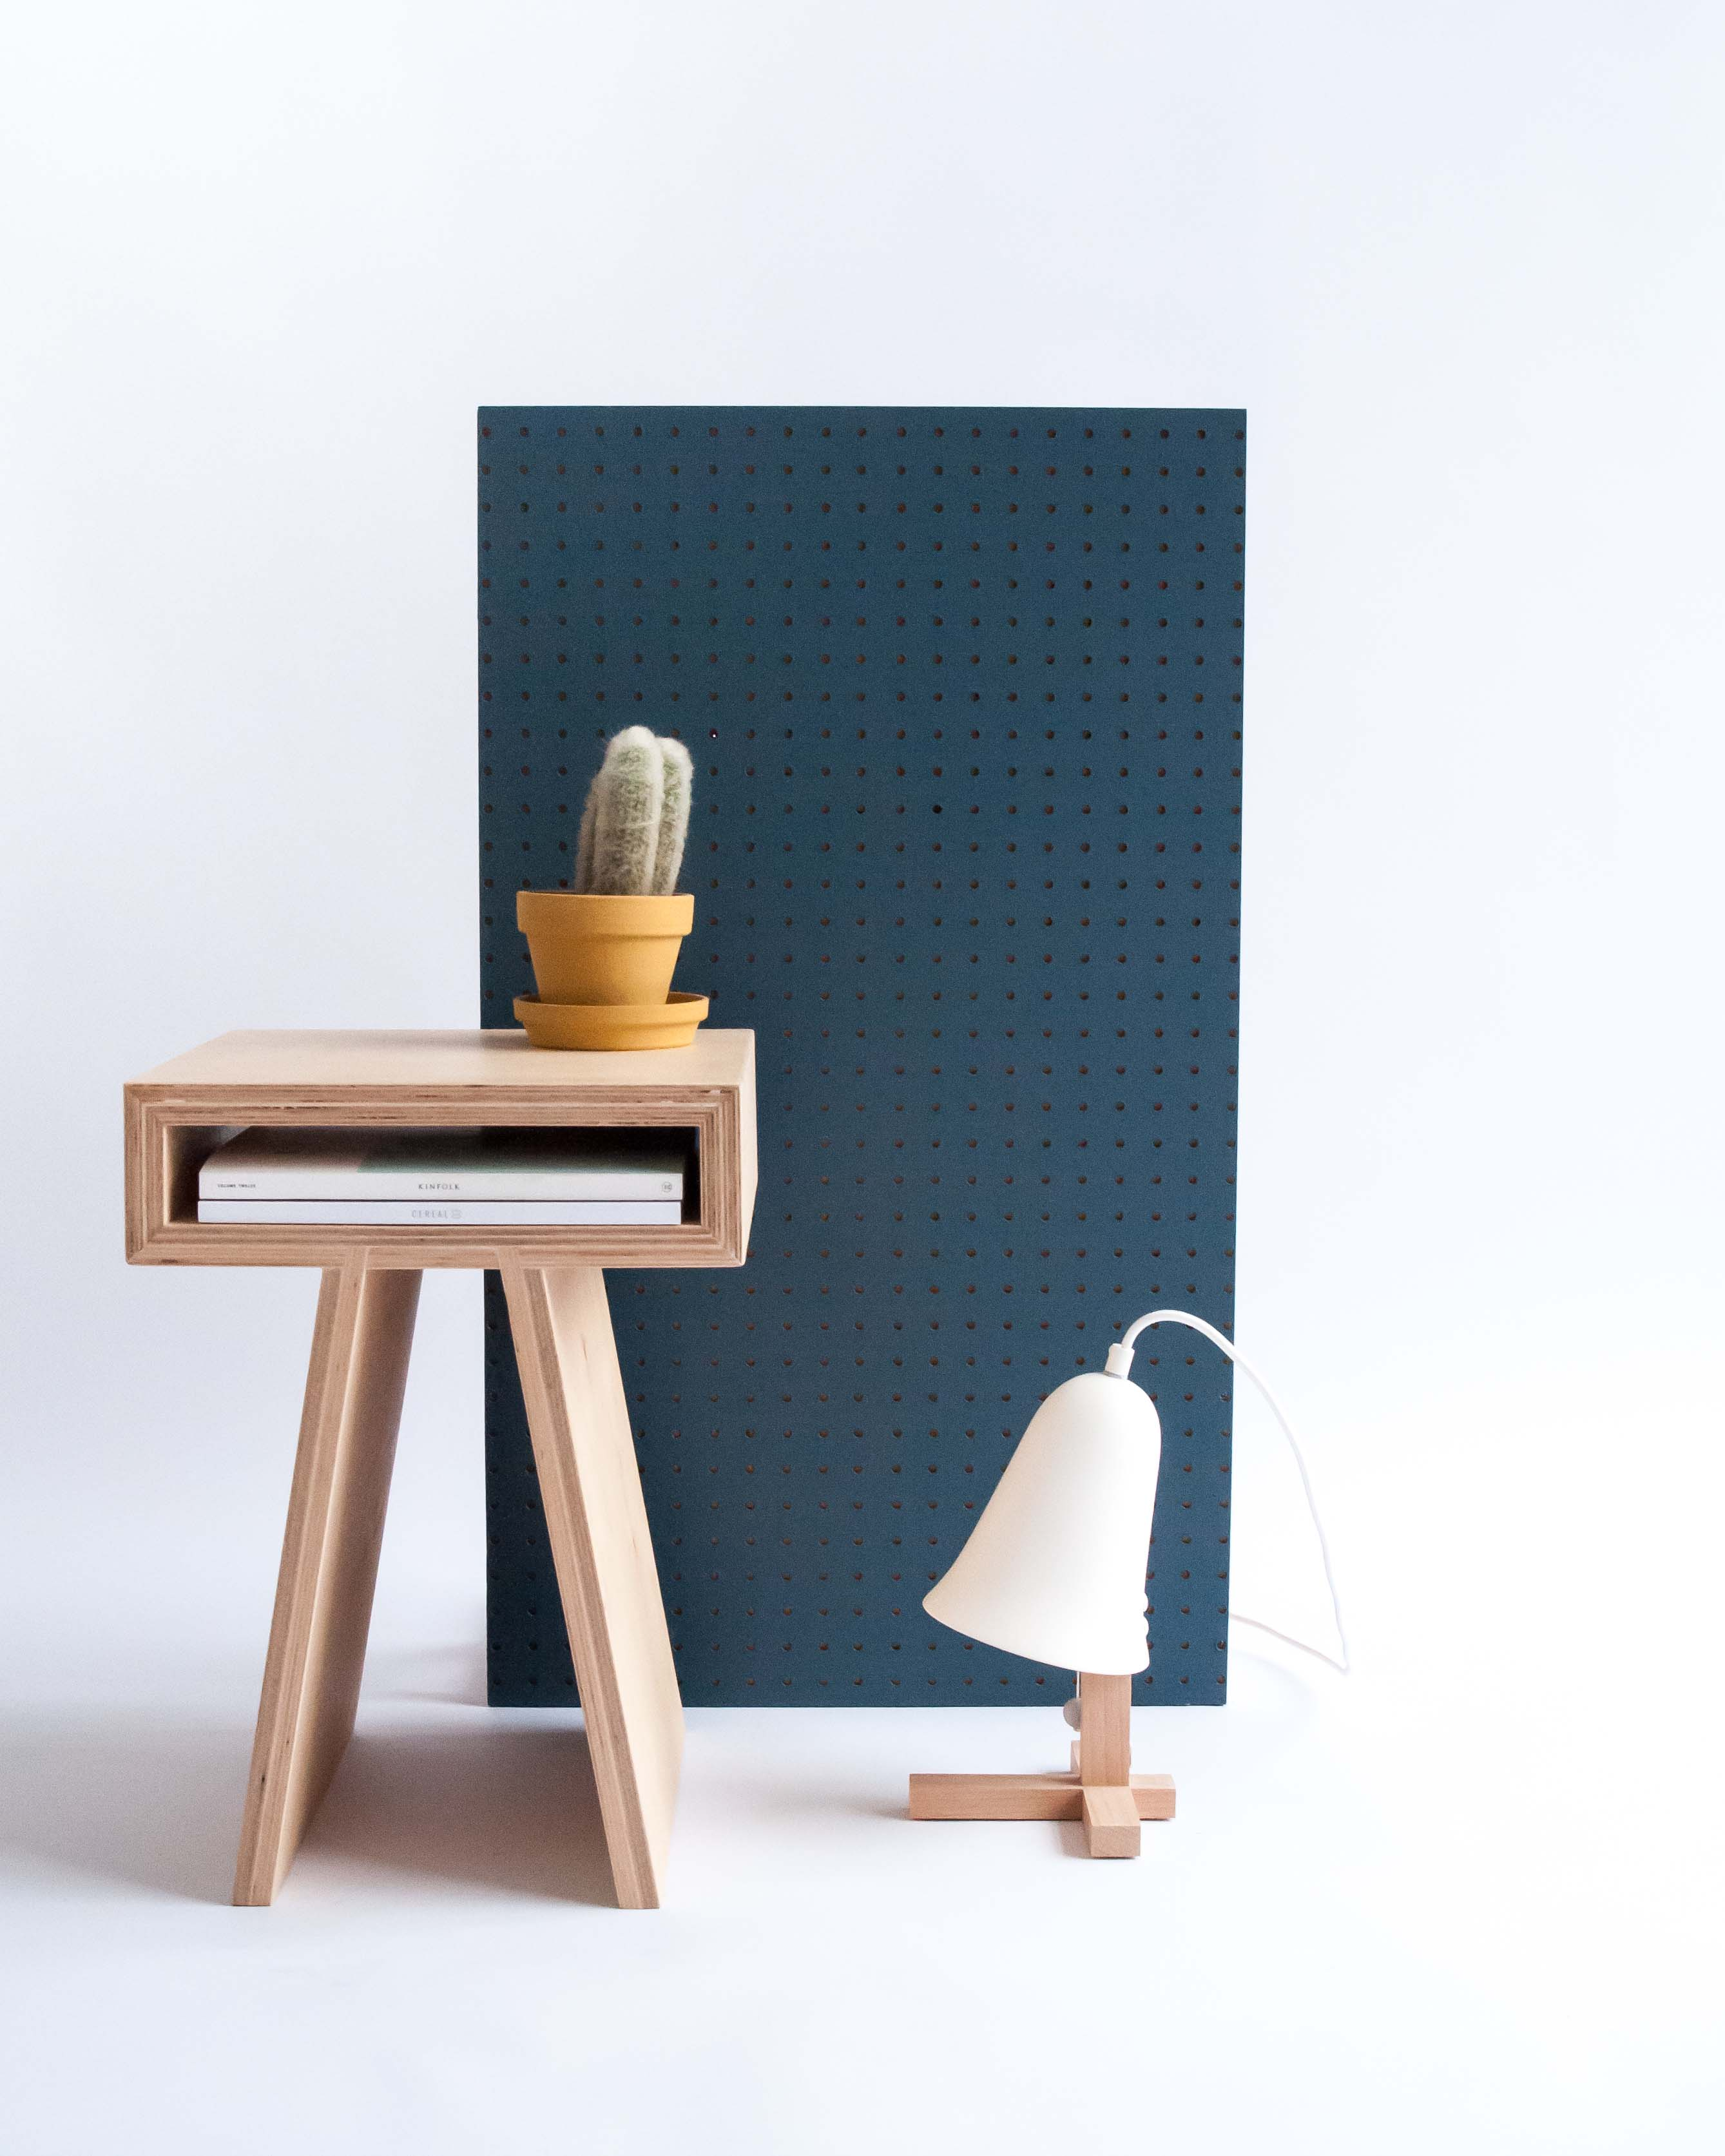 Mush tafellamp van M.OSS design I Gimmii Magazine